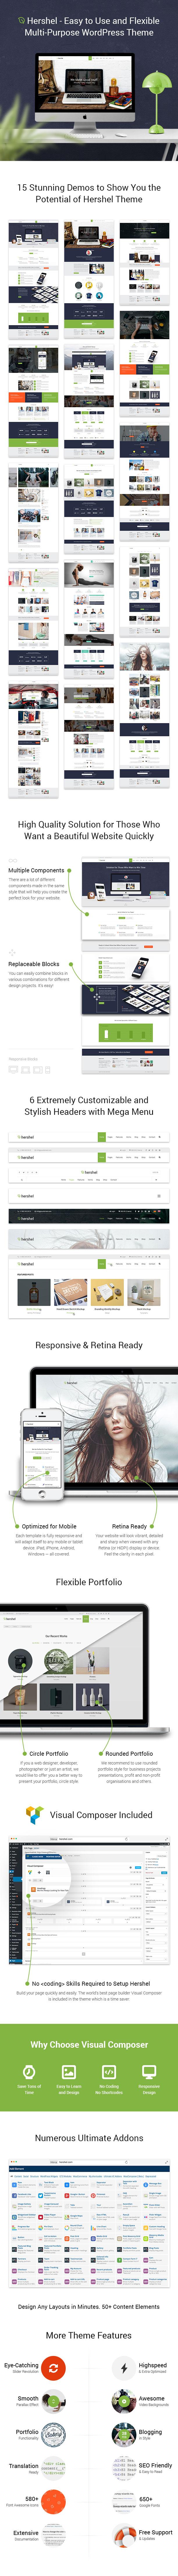 Hershel - Flexible Multipurpose WordPress Theme - 1